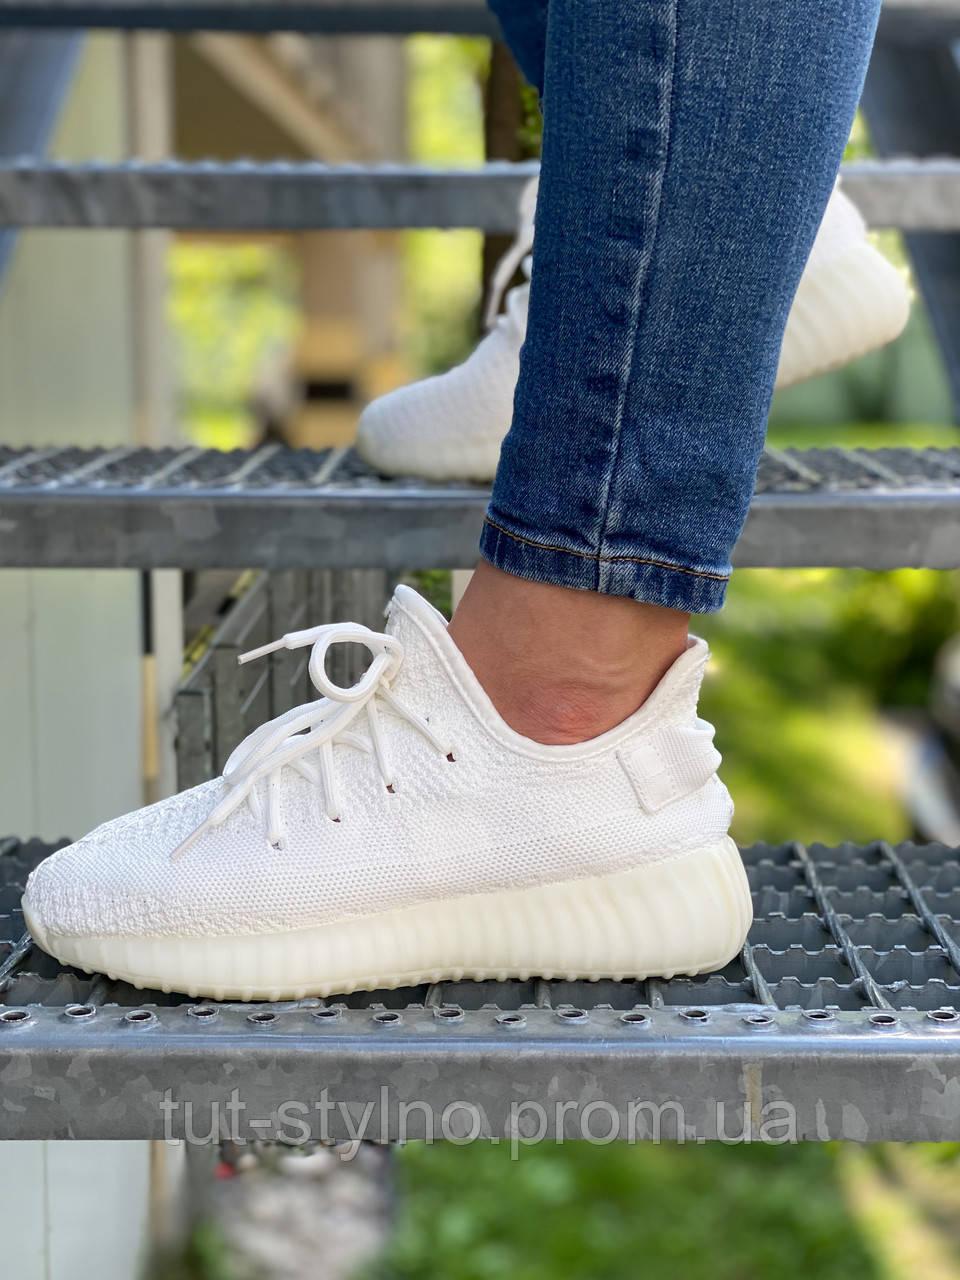 Adidas Yeezy Boost 350 Cream White (белые)